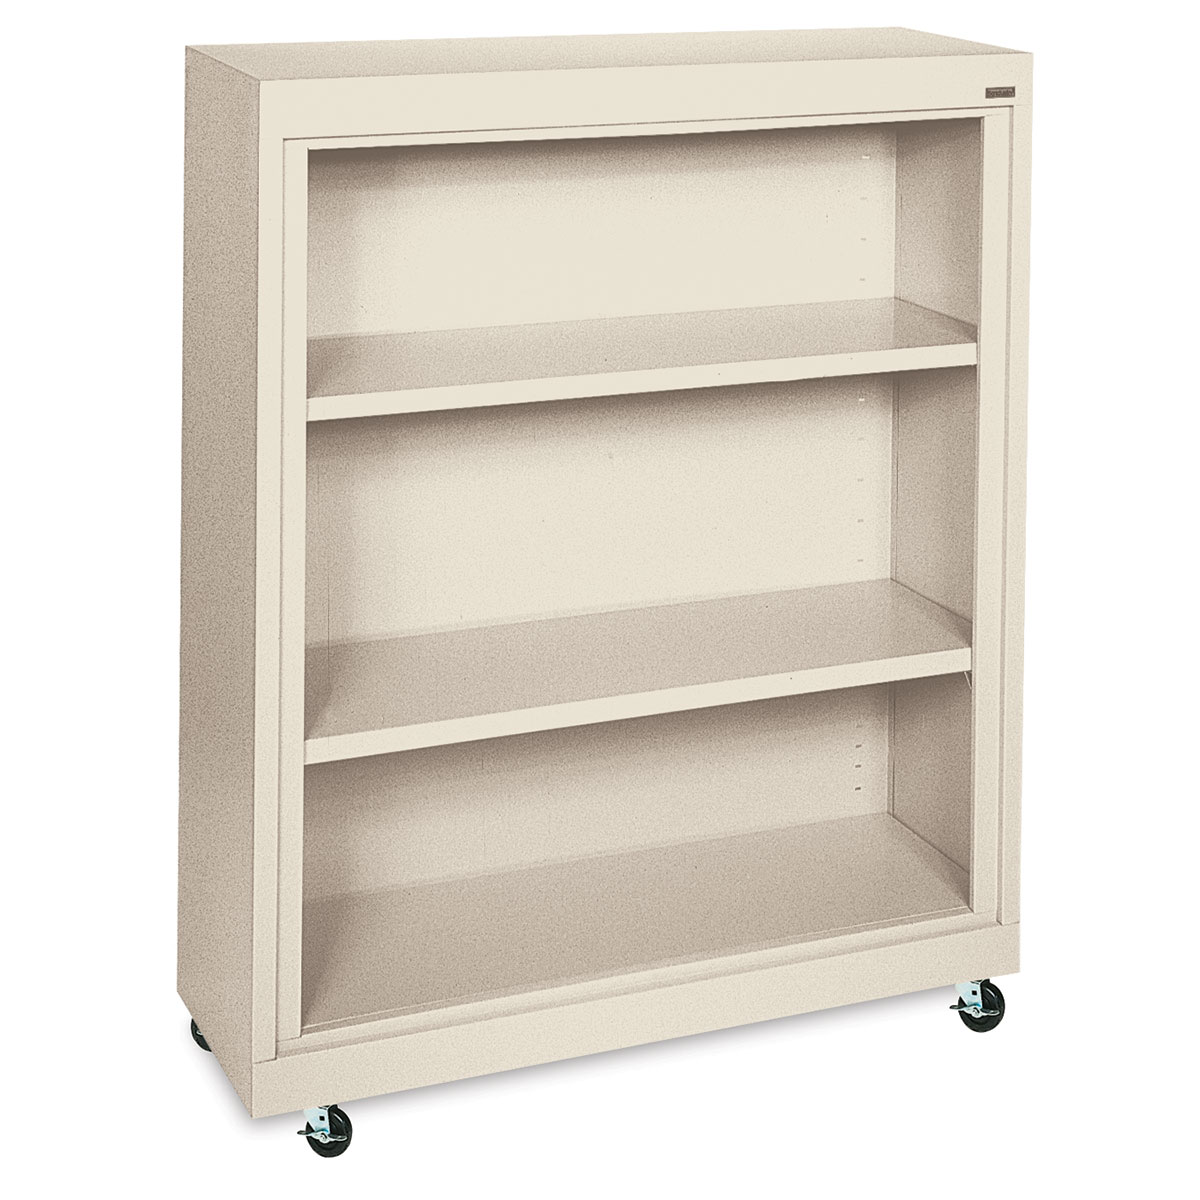 Sandusky Lee Mobile Bookcase - 36 x 48 x 18, Putty